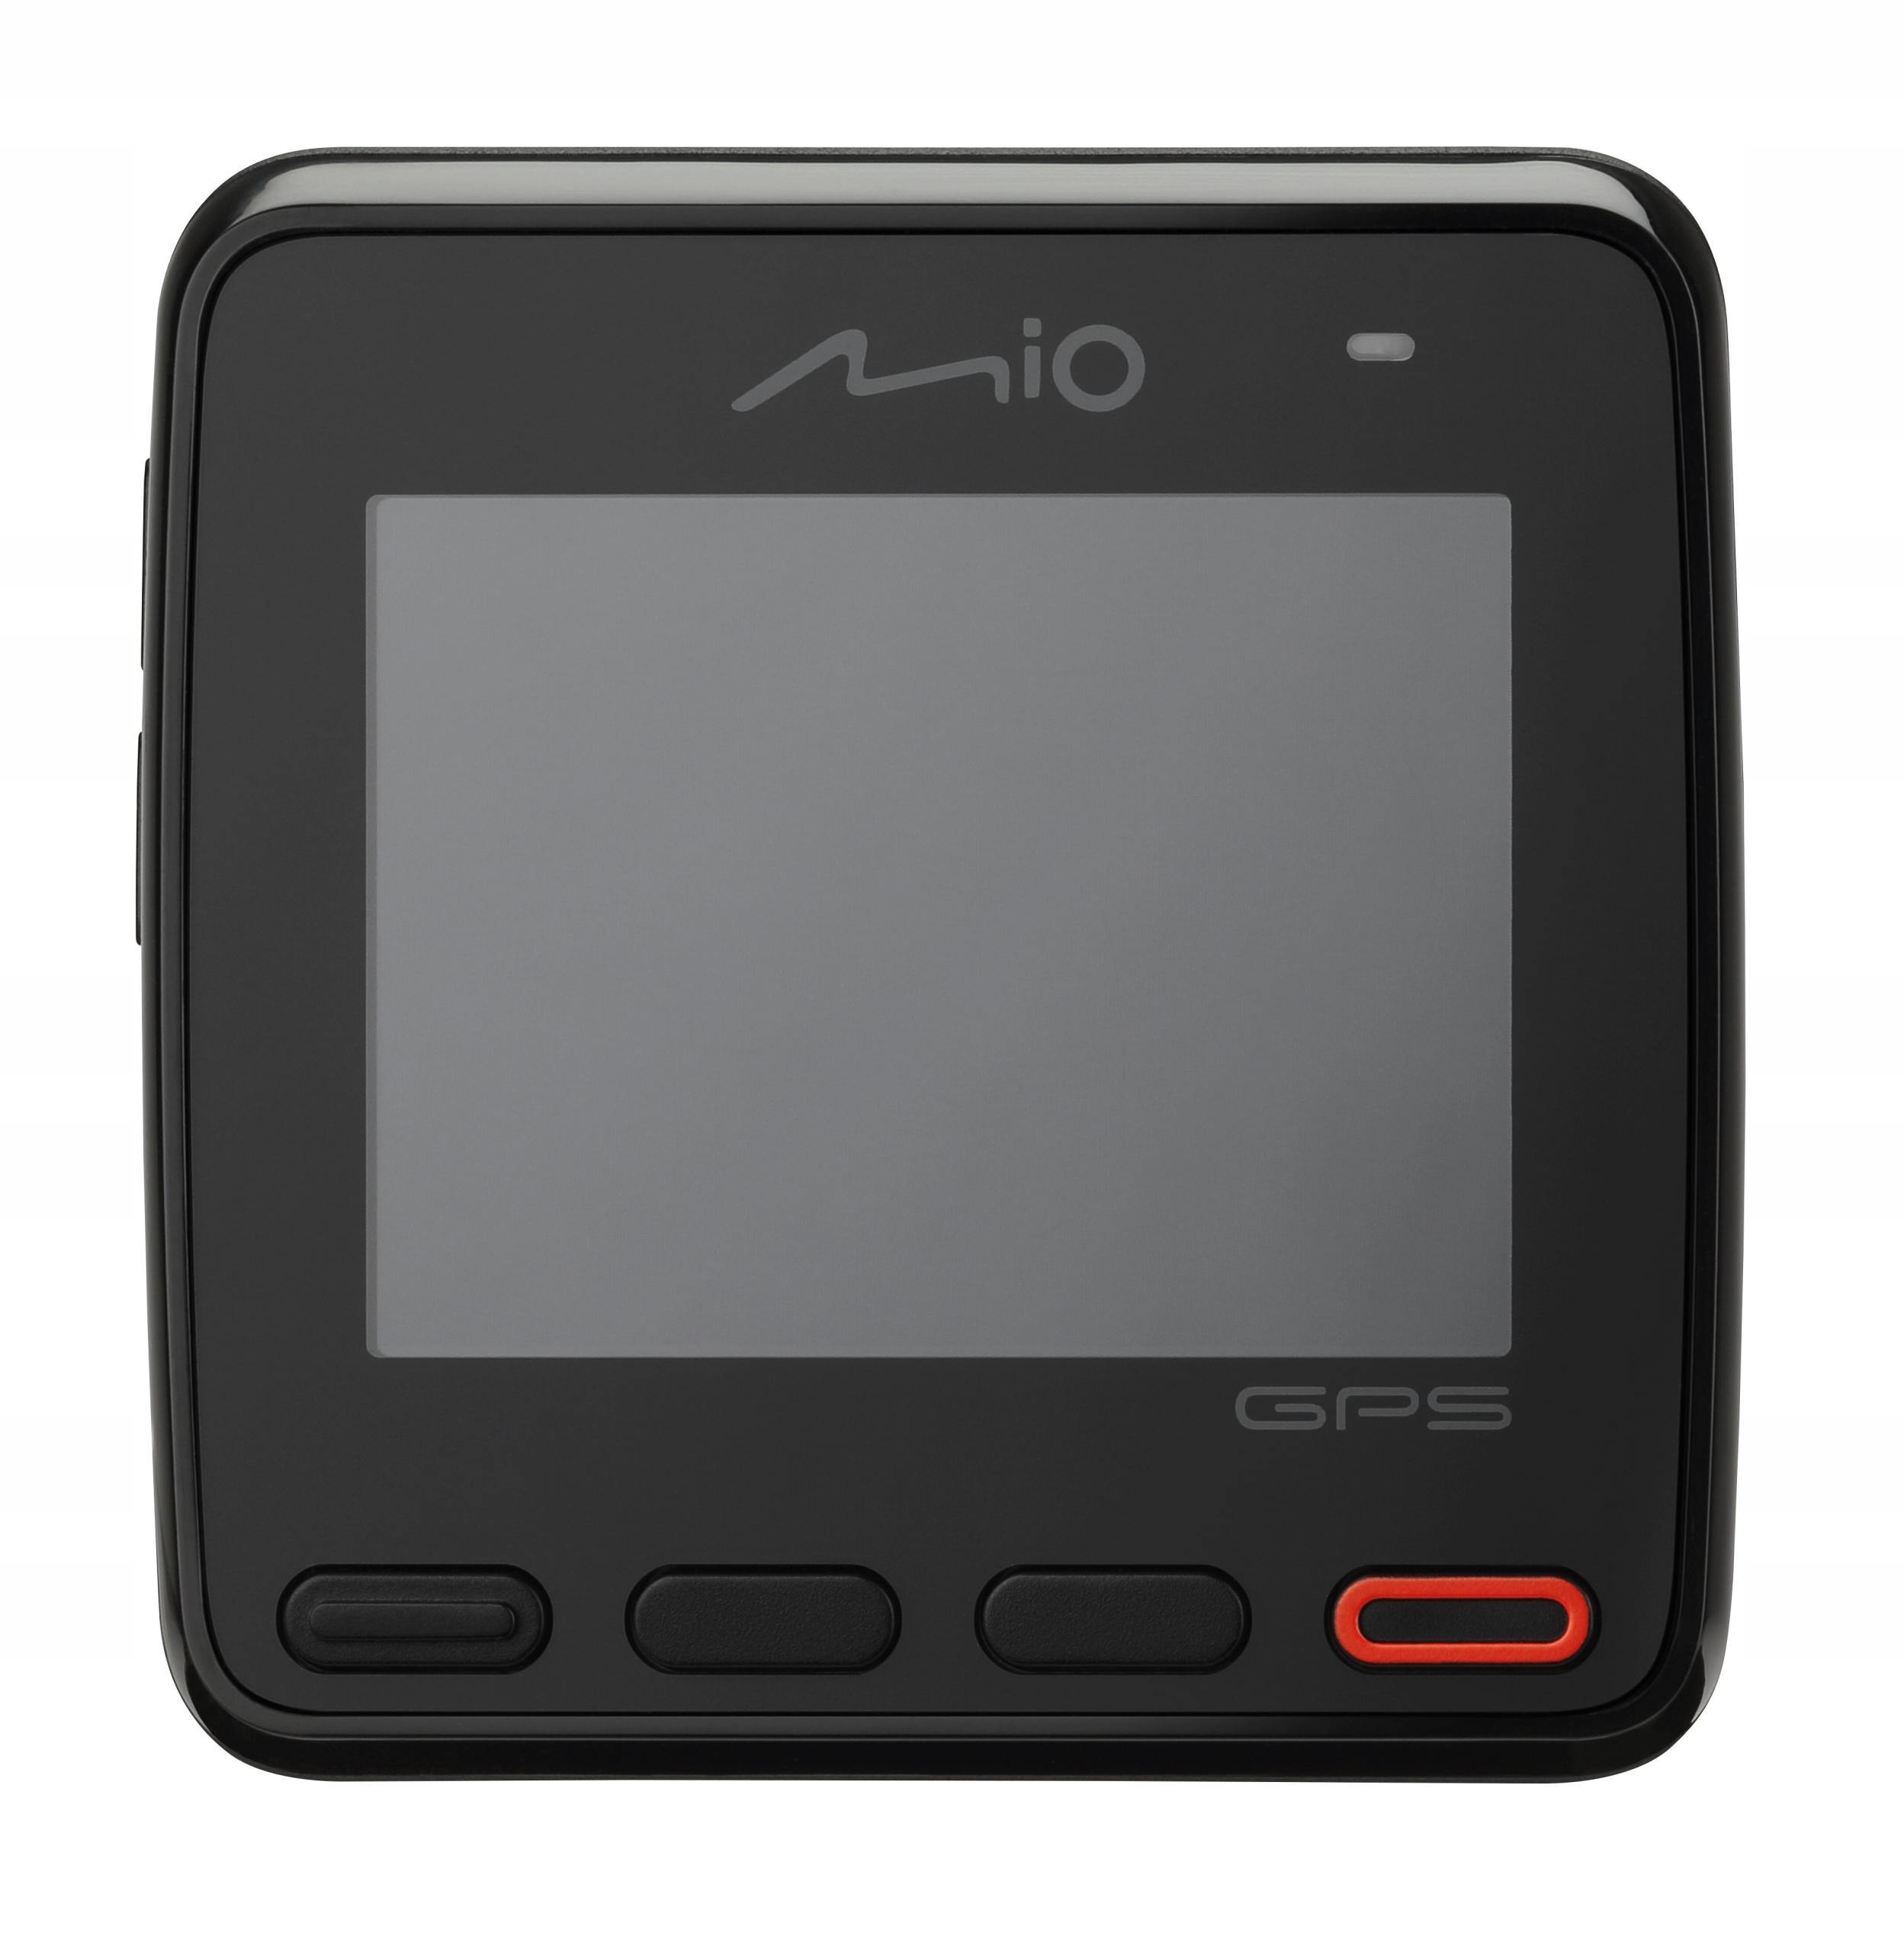 MIO MIVUE C430 REJESTRATOR GPS BAZA FOTORADARÓW Producent Mio